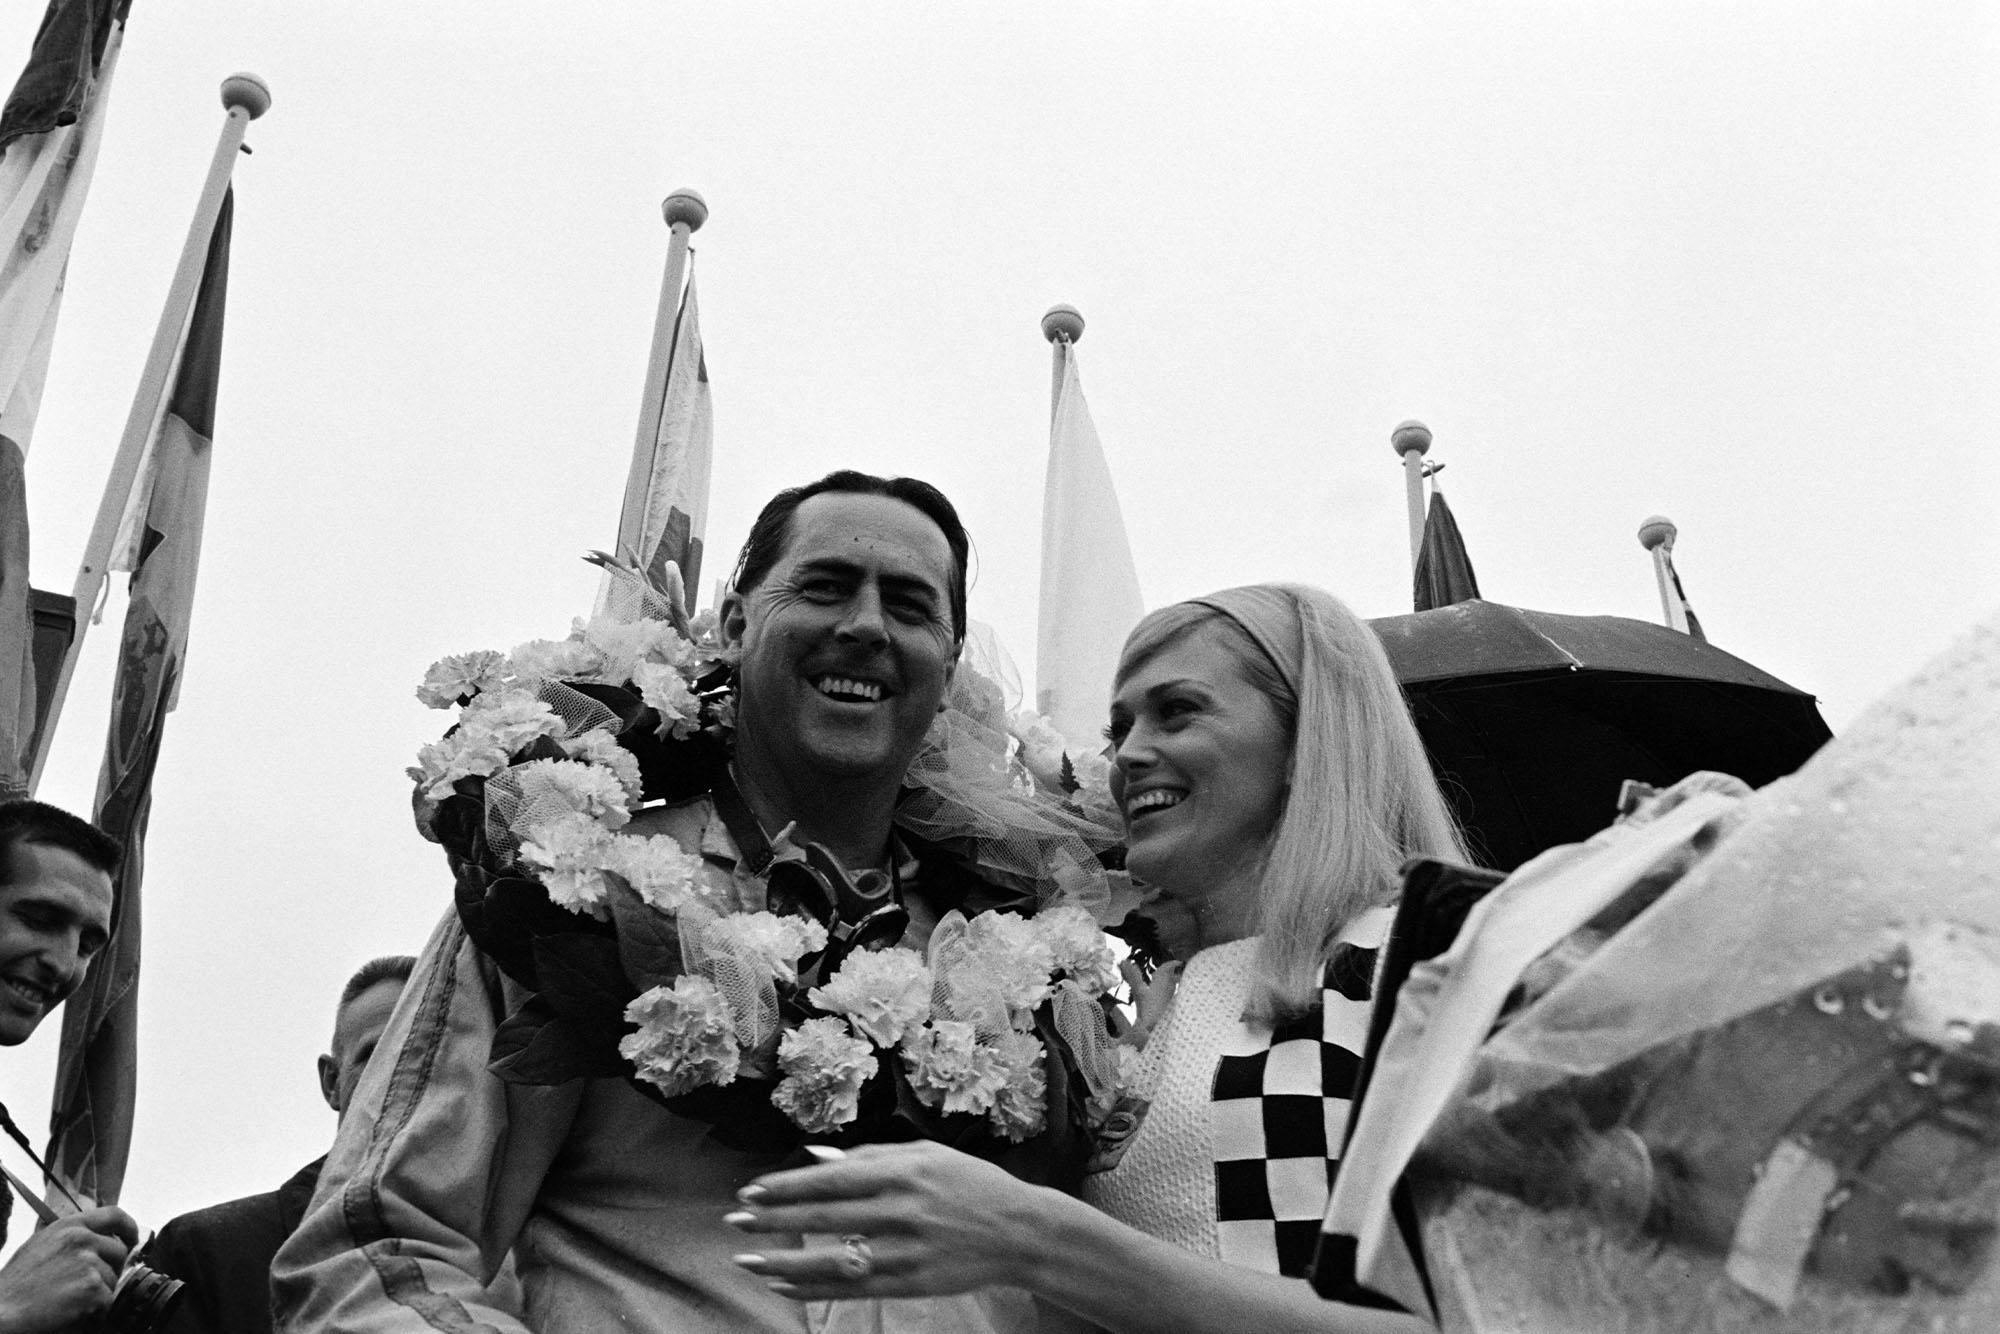 Jack Brabham, 1st position, on the podium.